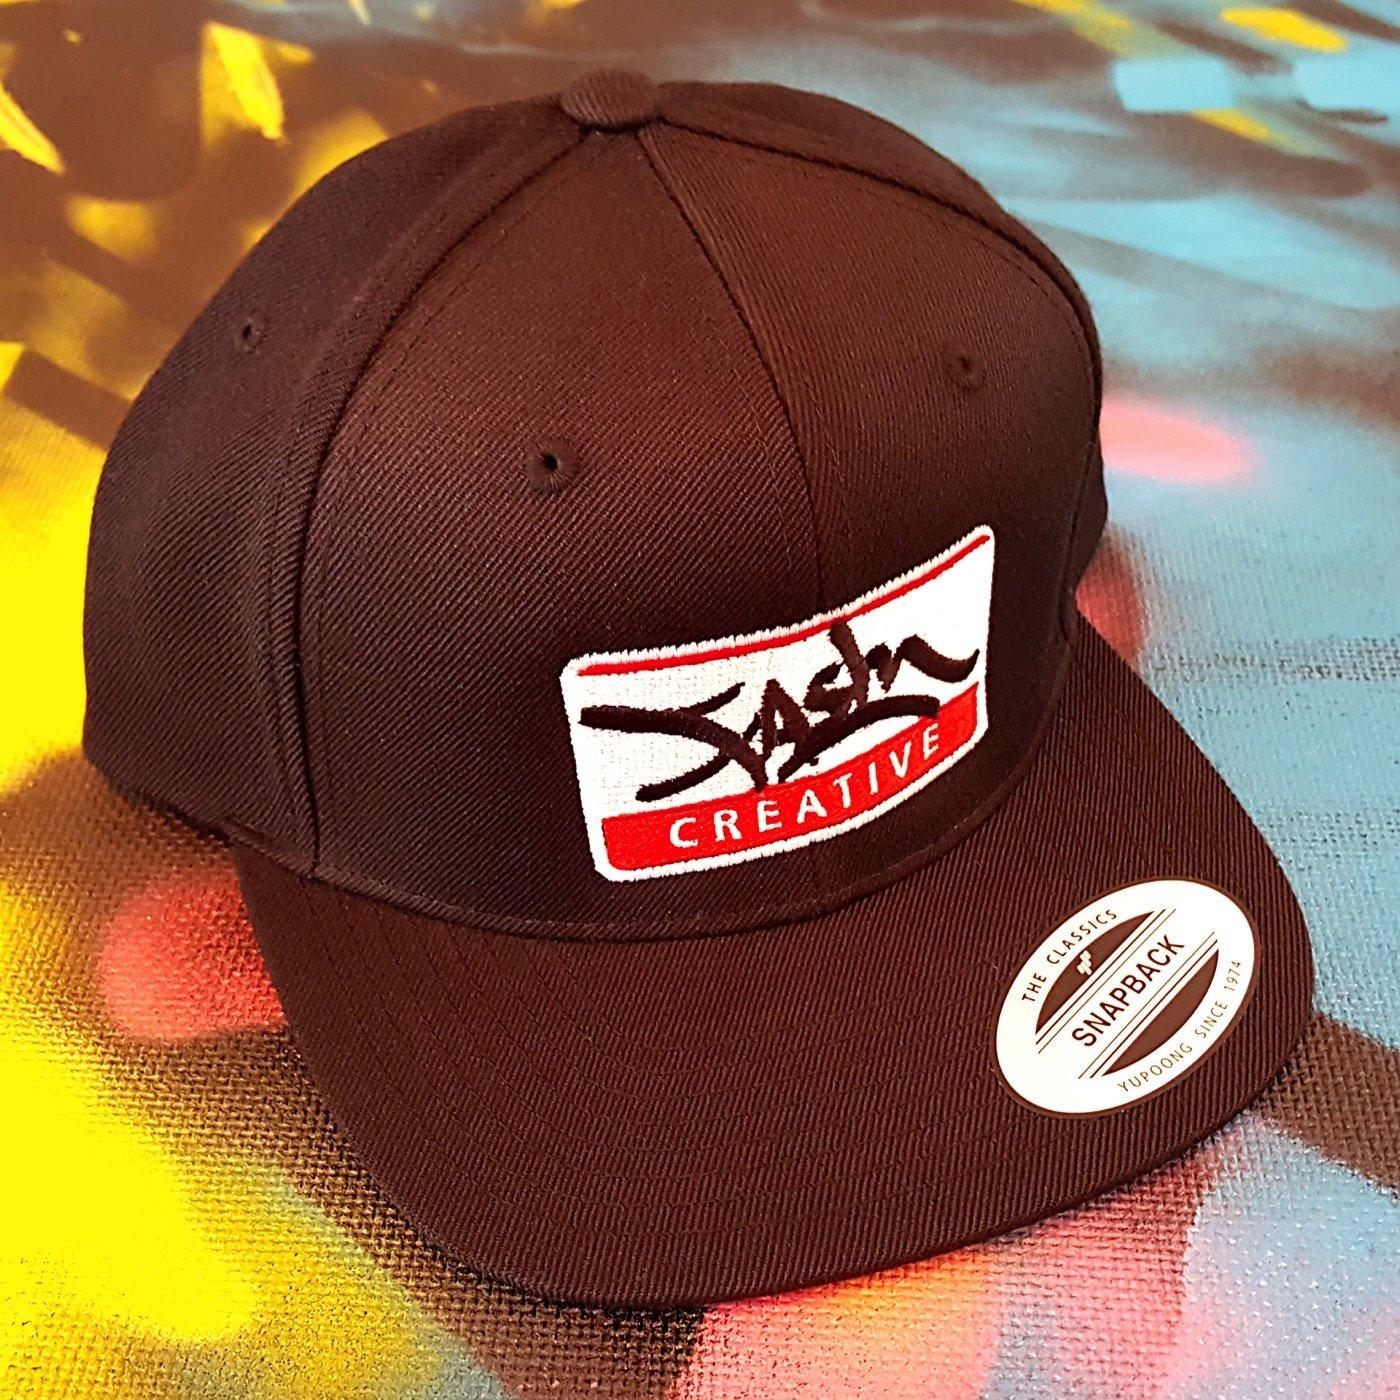 Fasm Creative Snap-back Hat